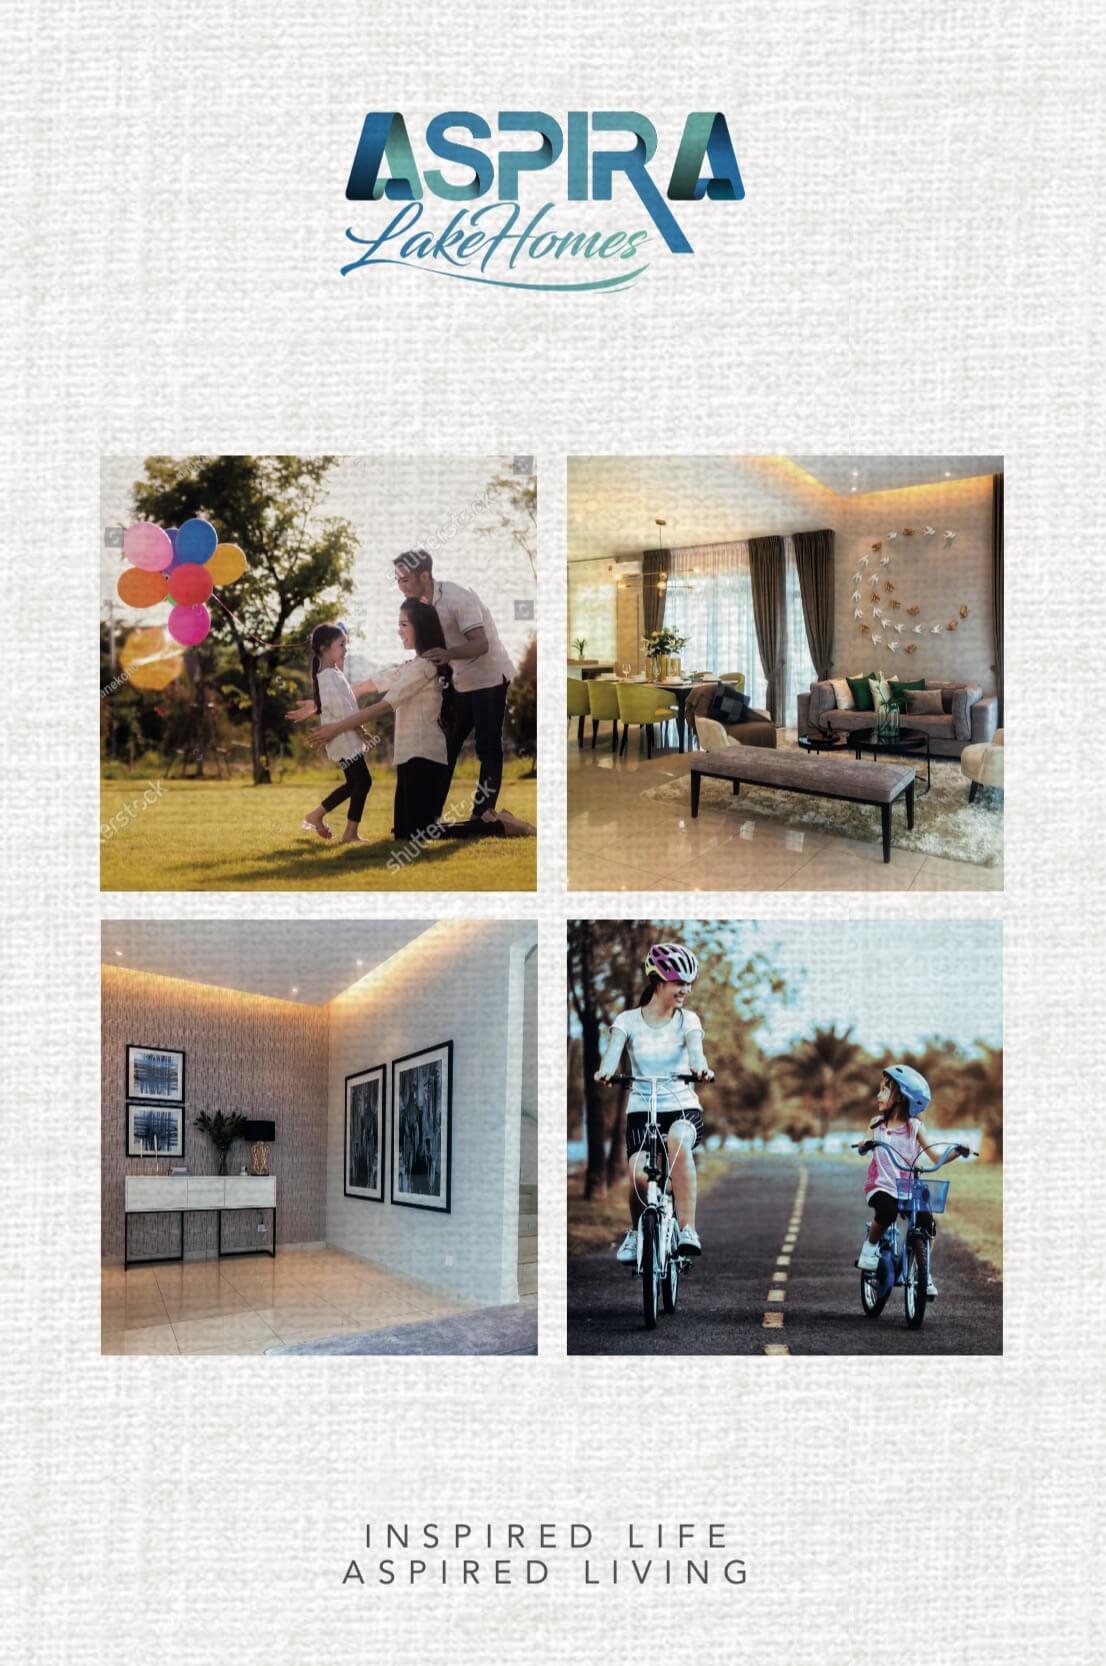 Aspira LakeHomes Brochure